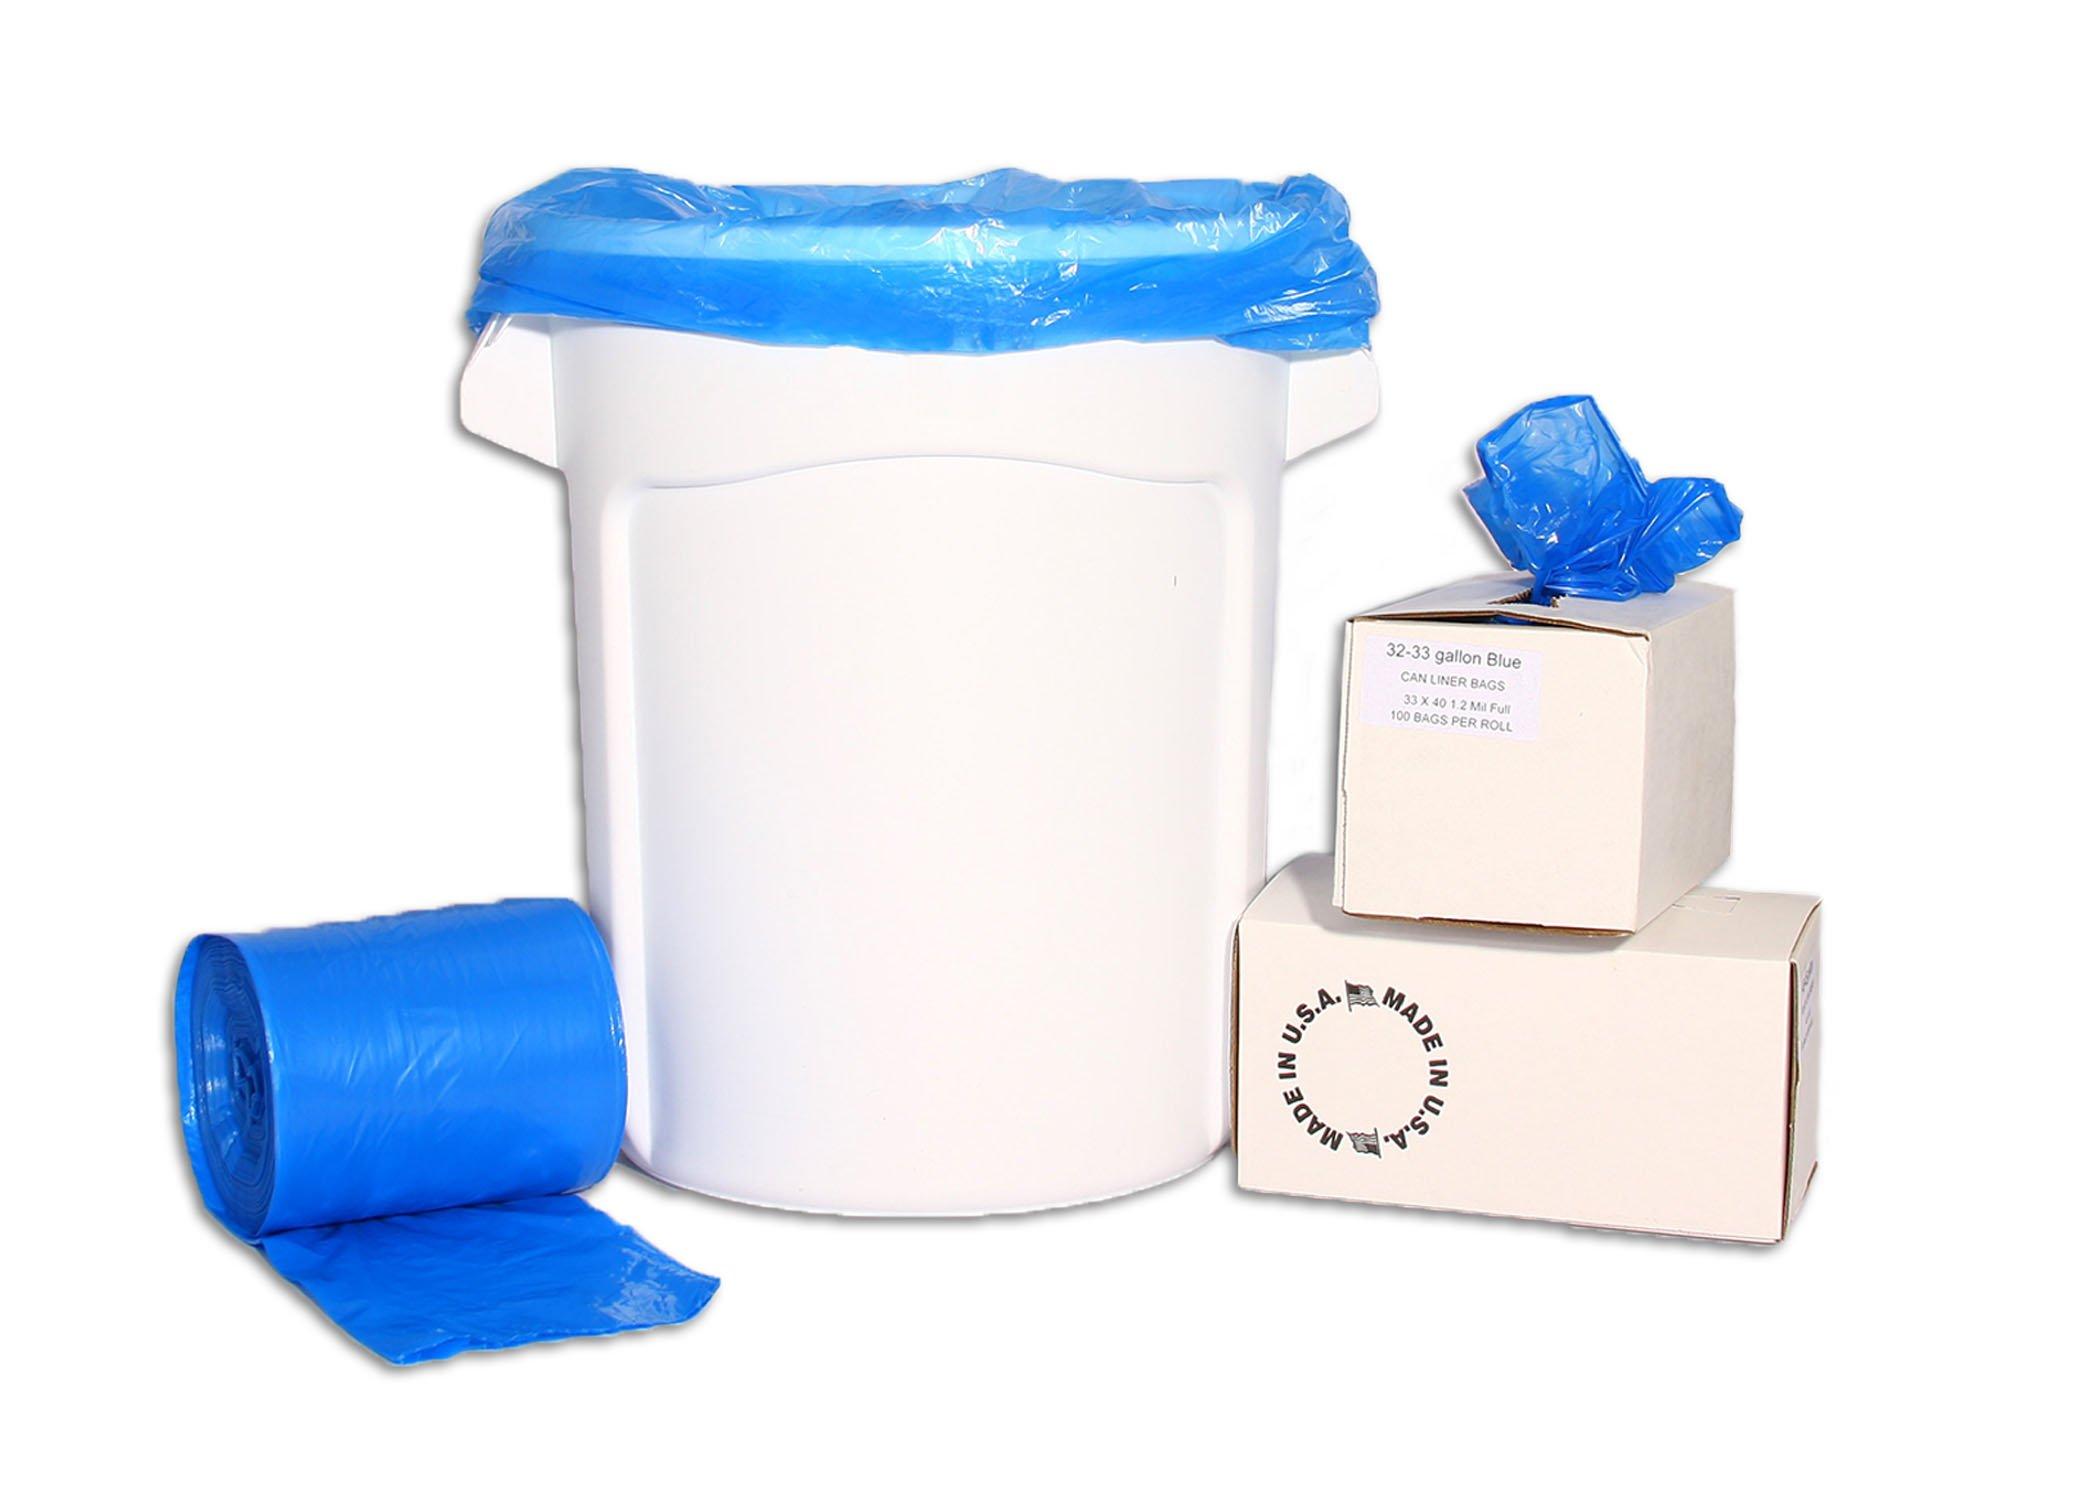 Resilia - 33 Gallon Trash Can Liners (Blue)